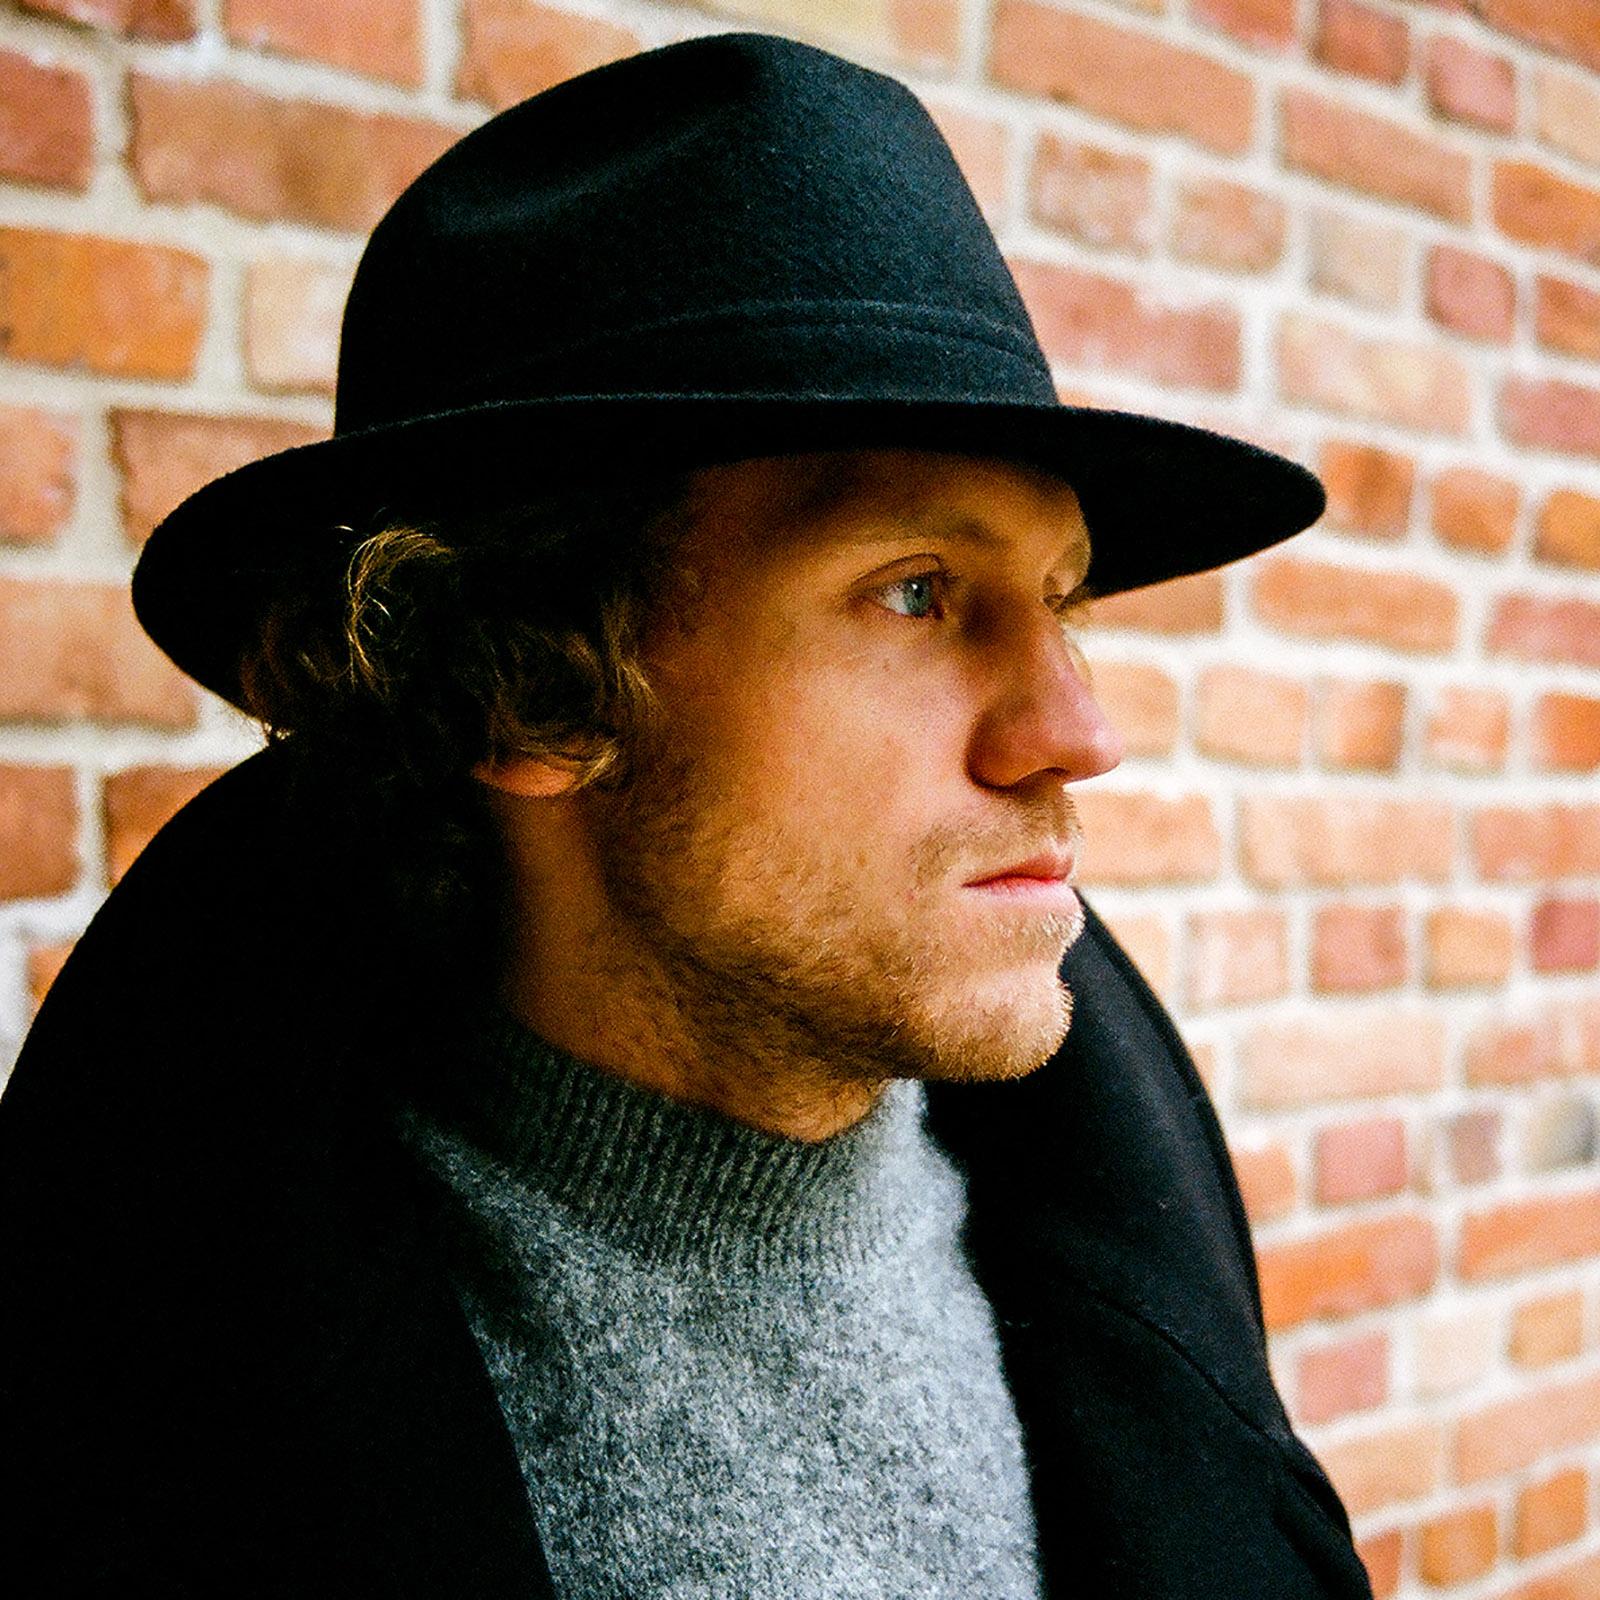 Wool cloth fedora hat wide brim classic jazz vintage boho mobster gangster crown dressy trilby formal fashion wide large brim